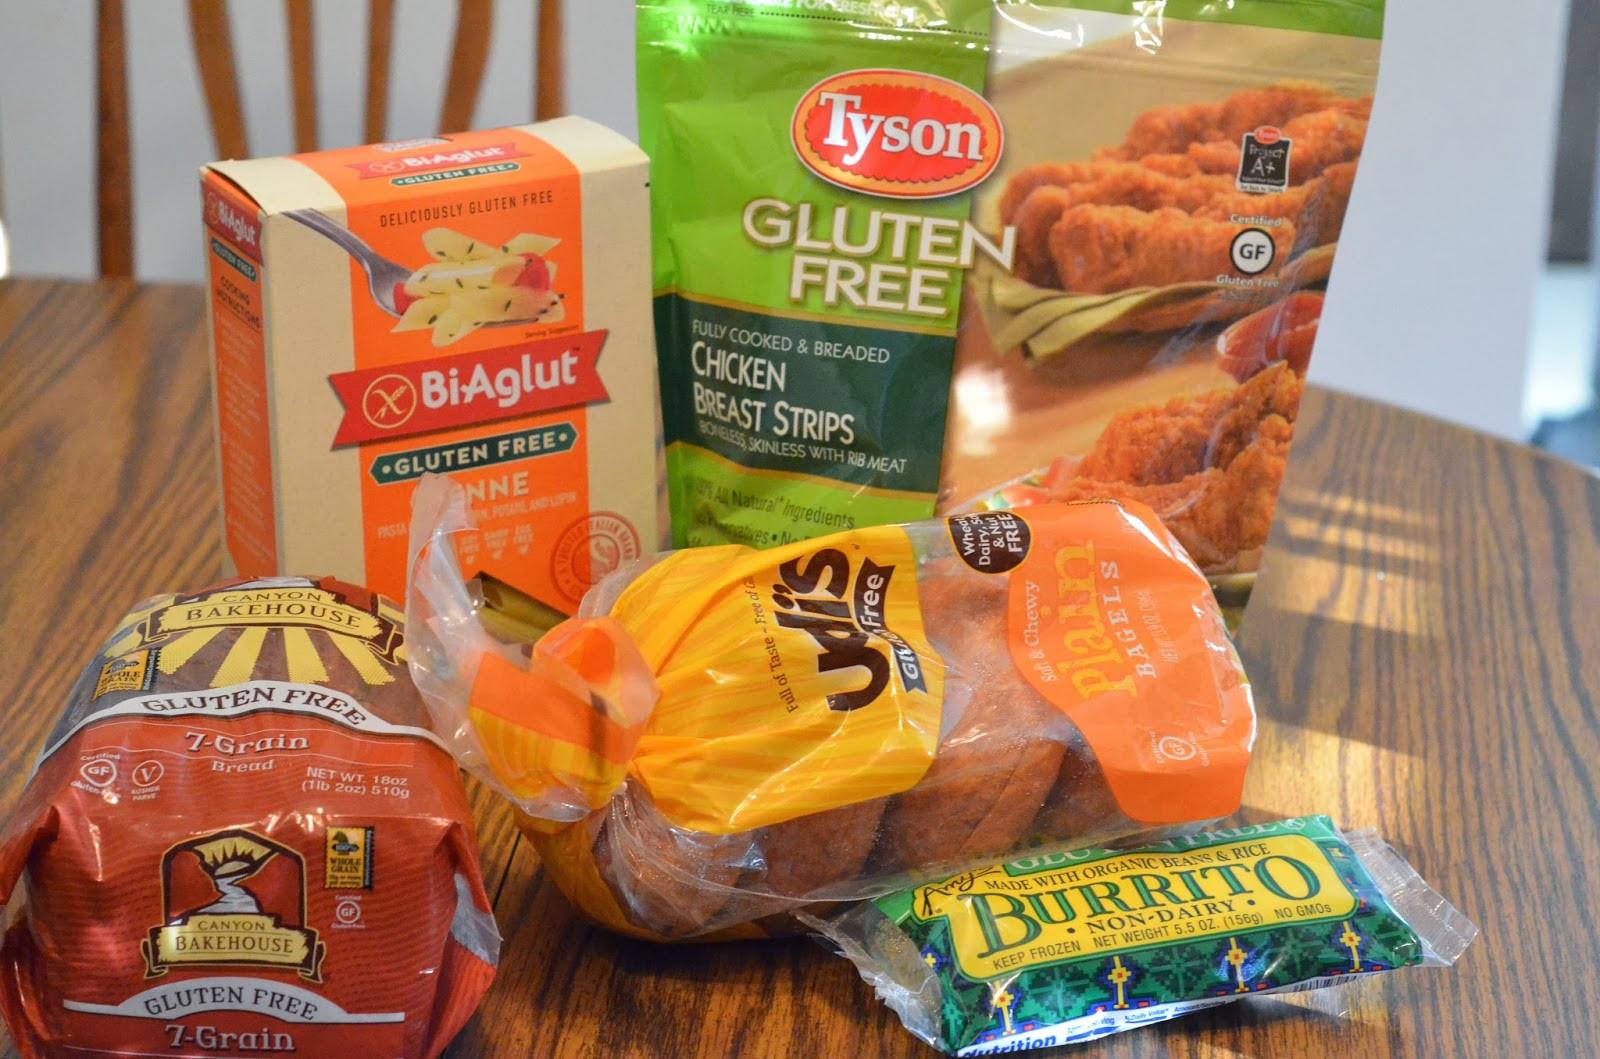 Gluten Free Bread Target  D s Gluten Free With Me